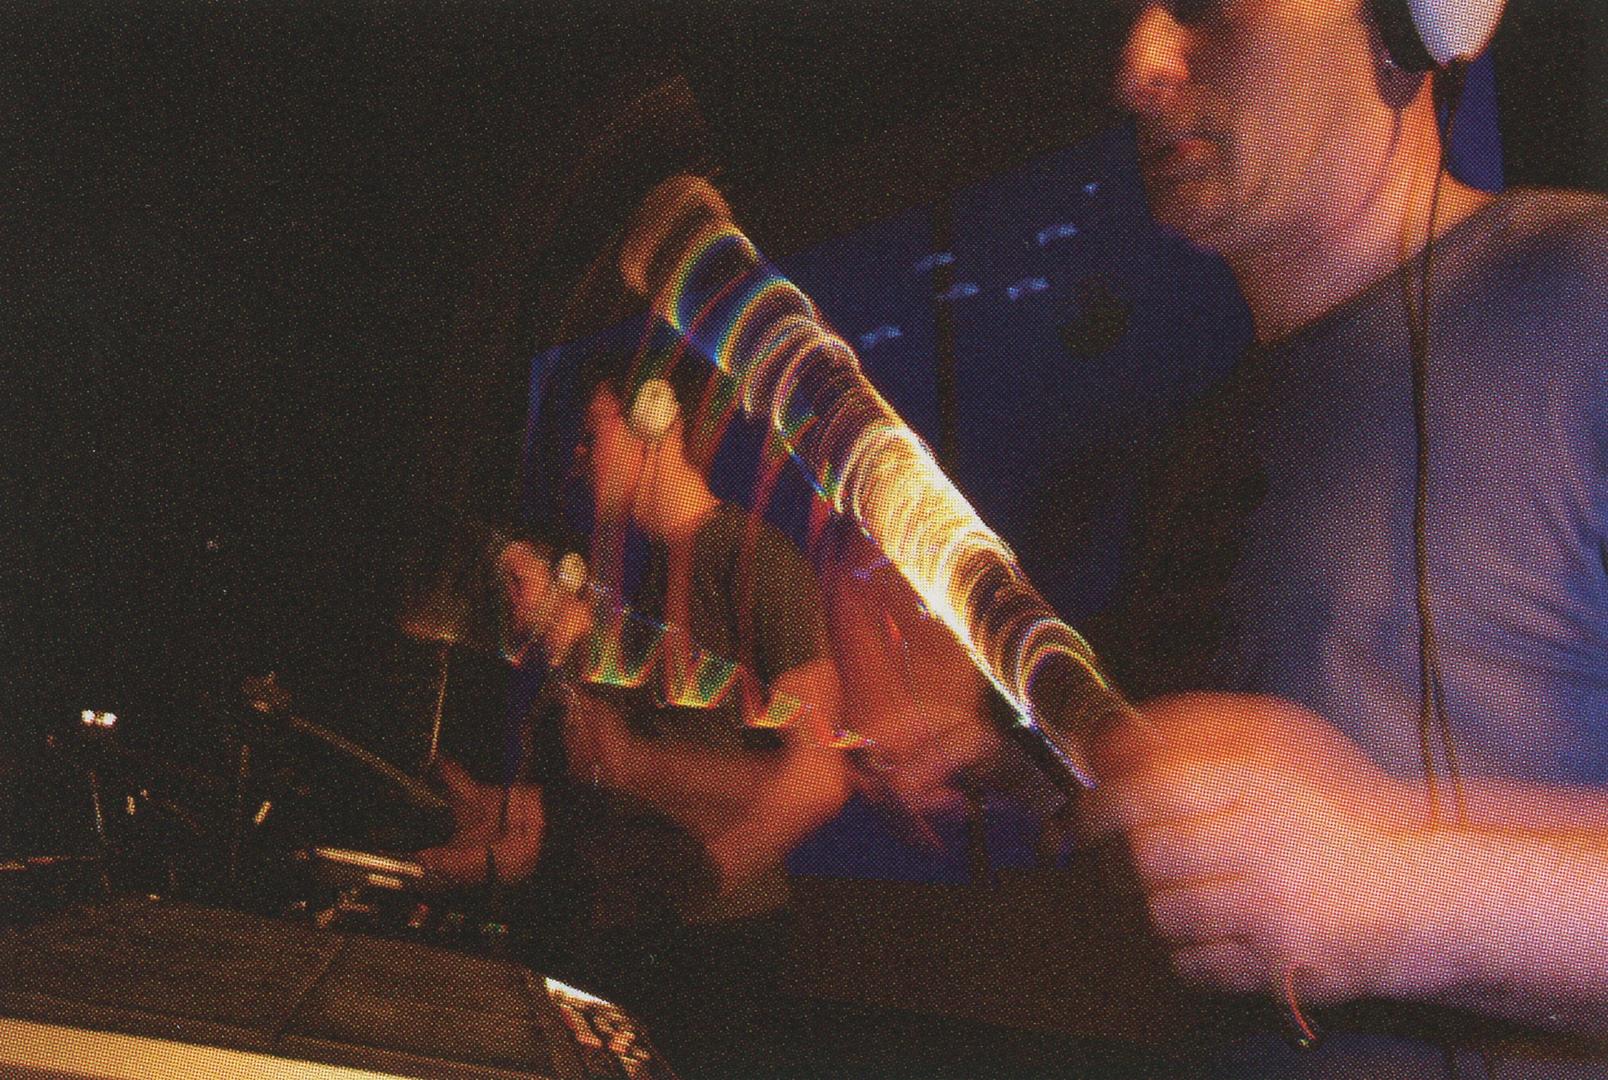 ©2008, Adam Hoyle, Ed Cookson, Edd Dawson-Taylor, Lewis Sykes, and Olly Venning